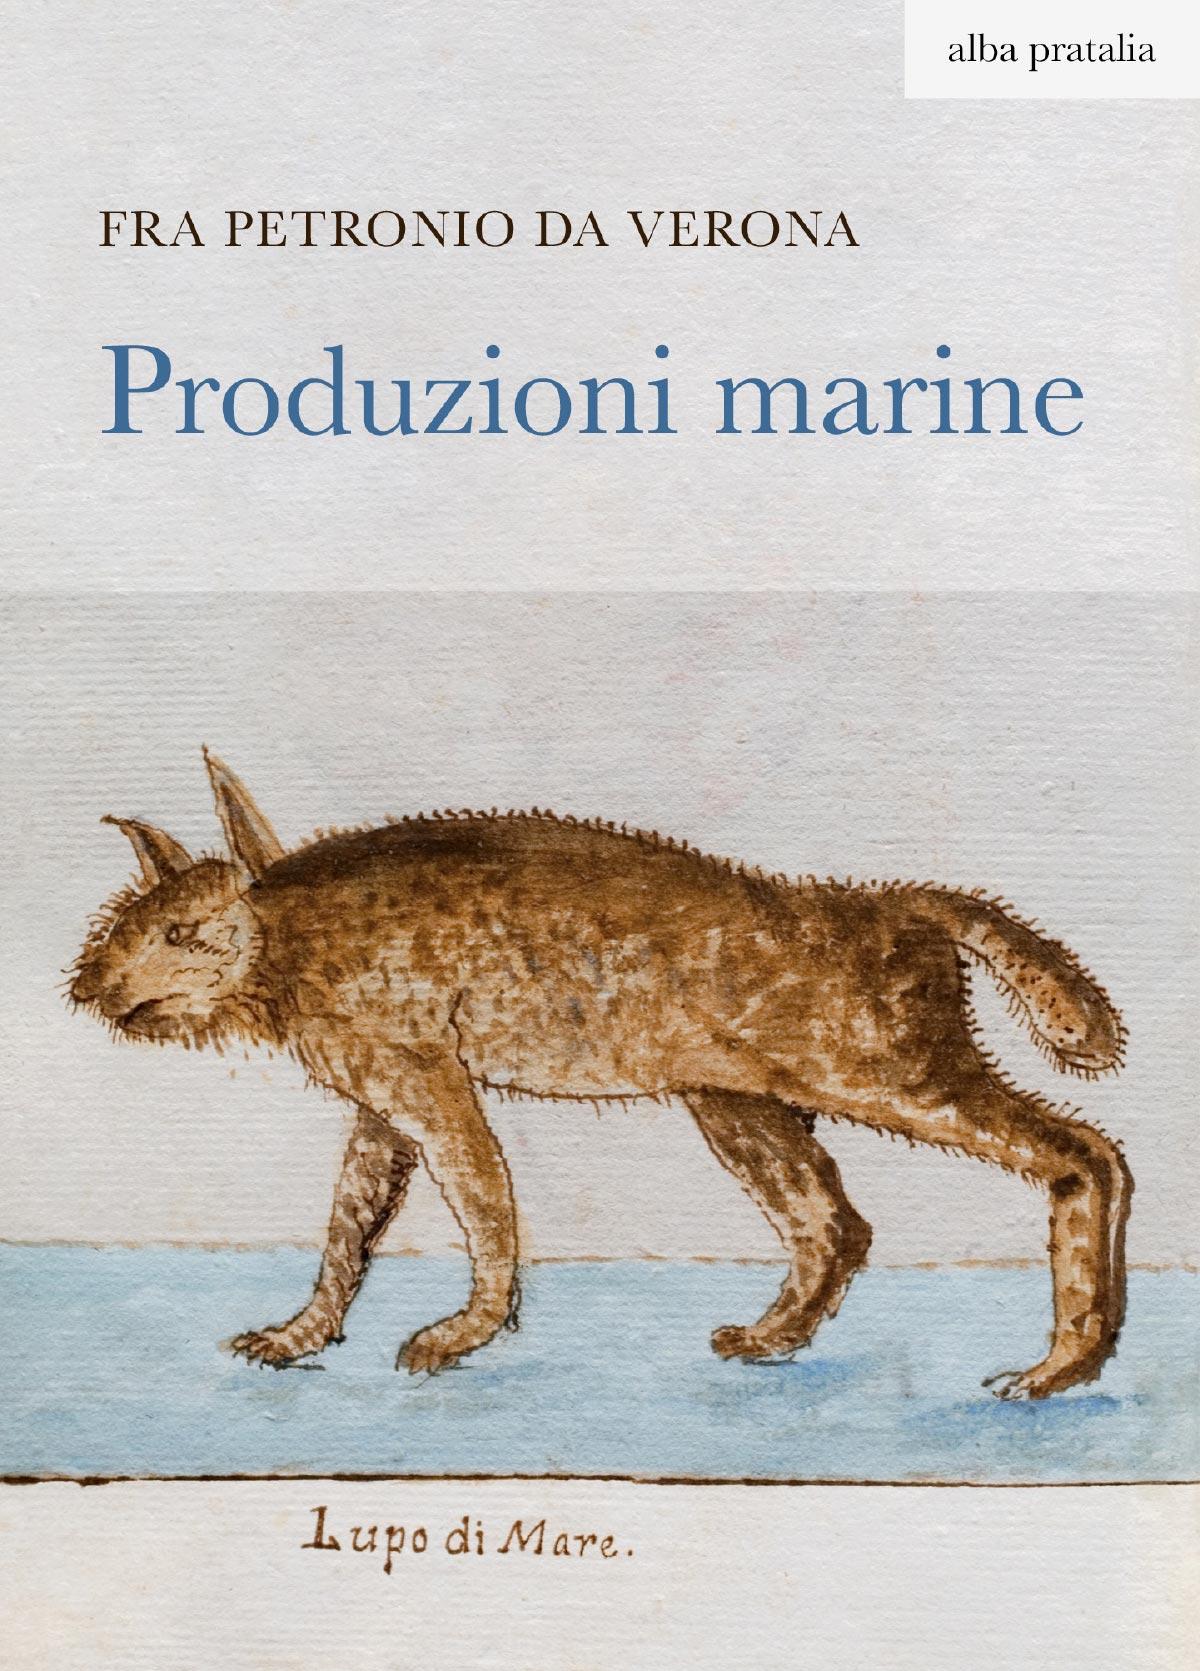 Produzioni marine Fra Petronio da Verona